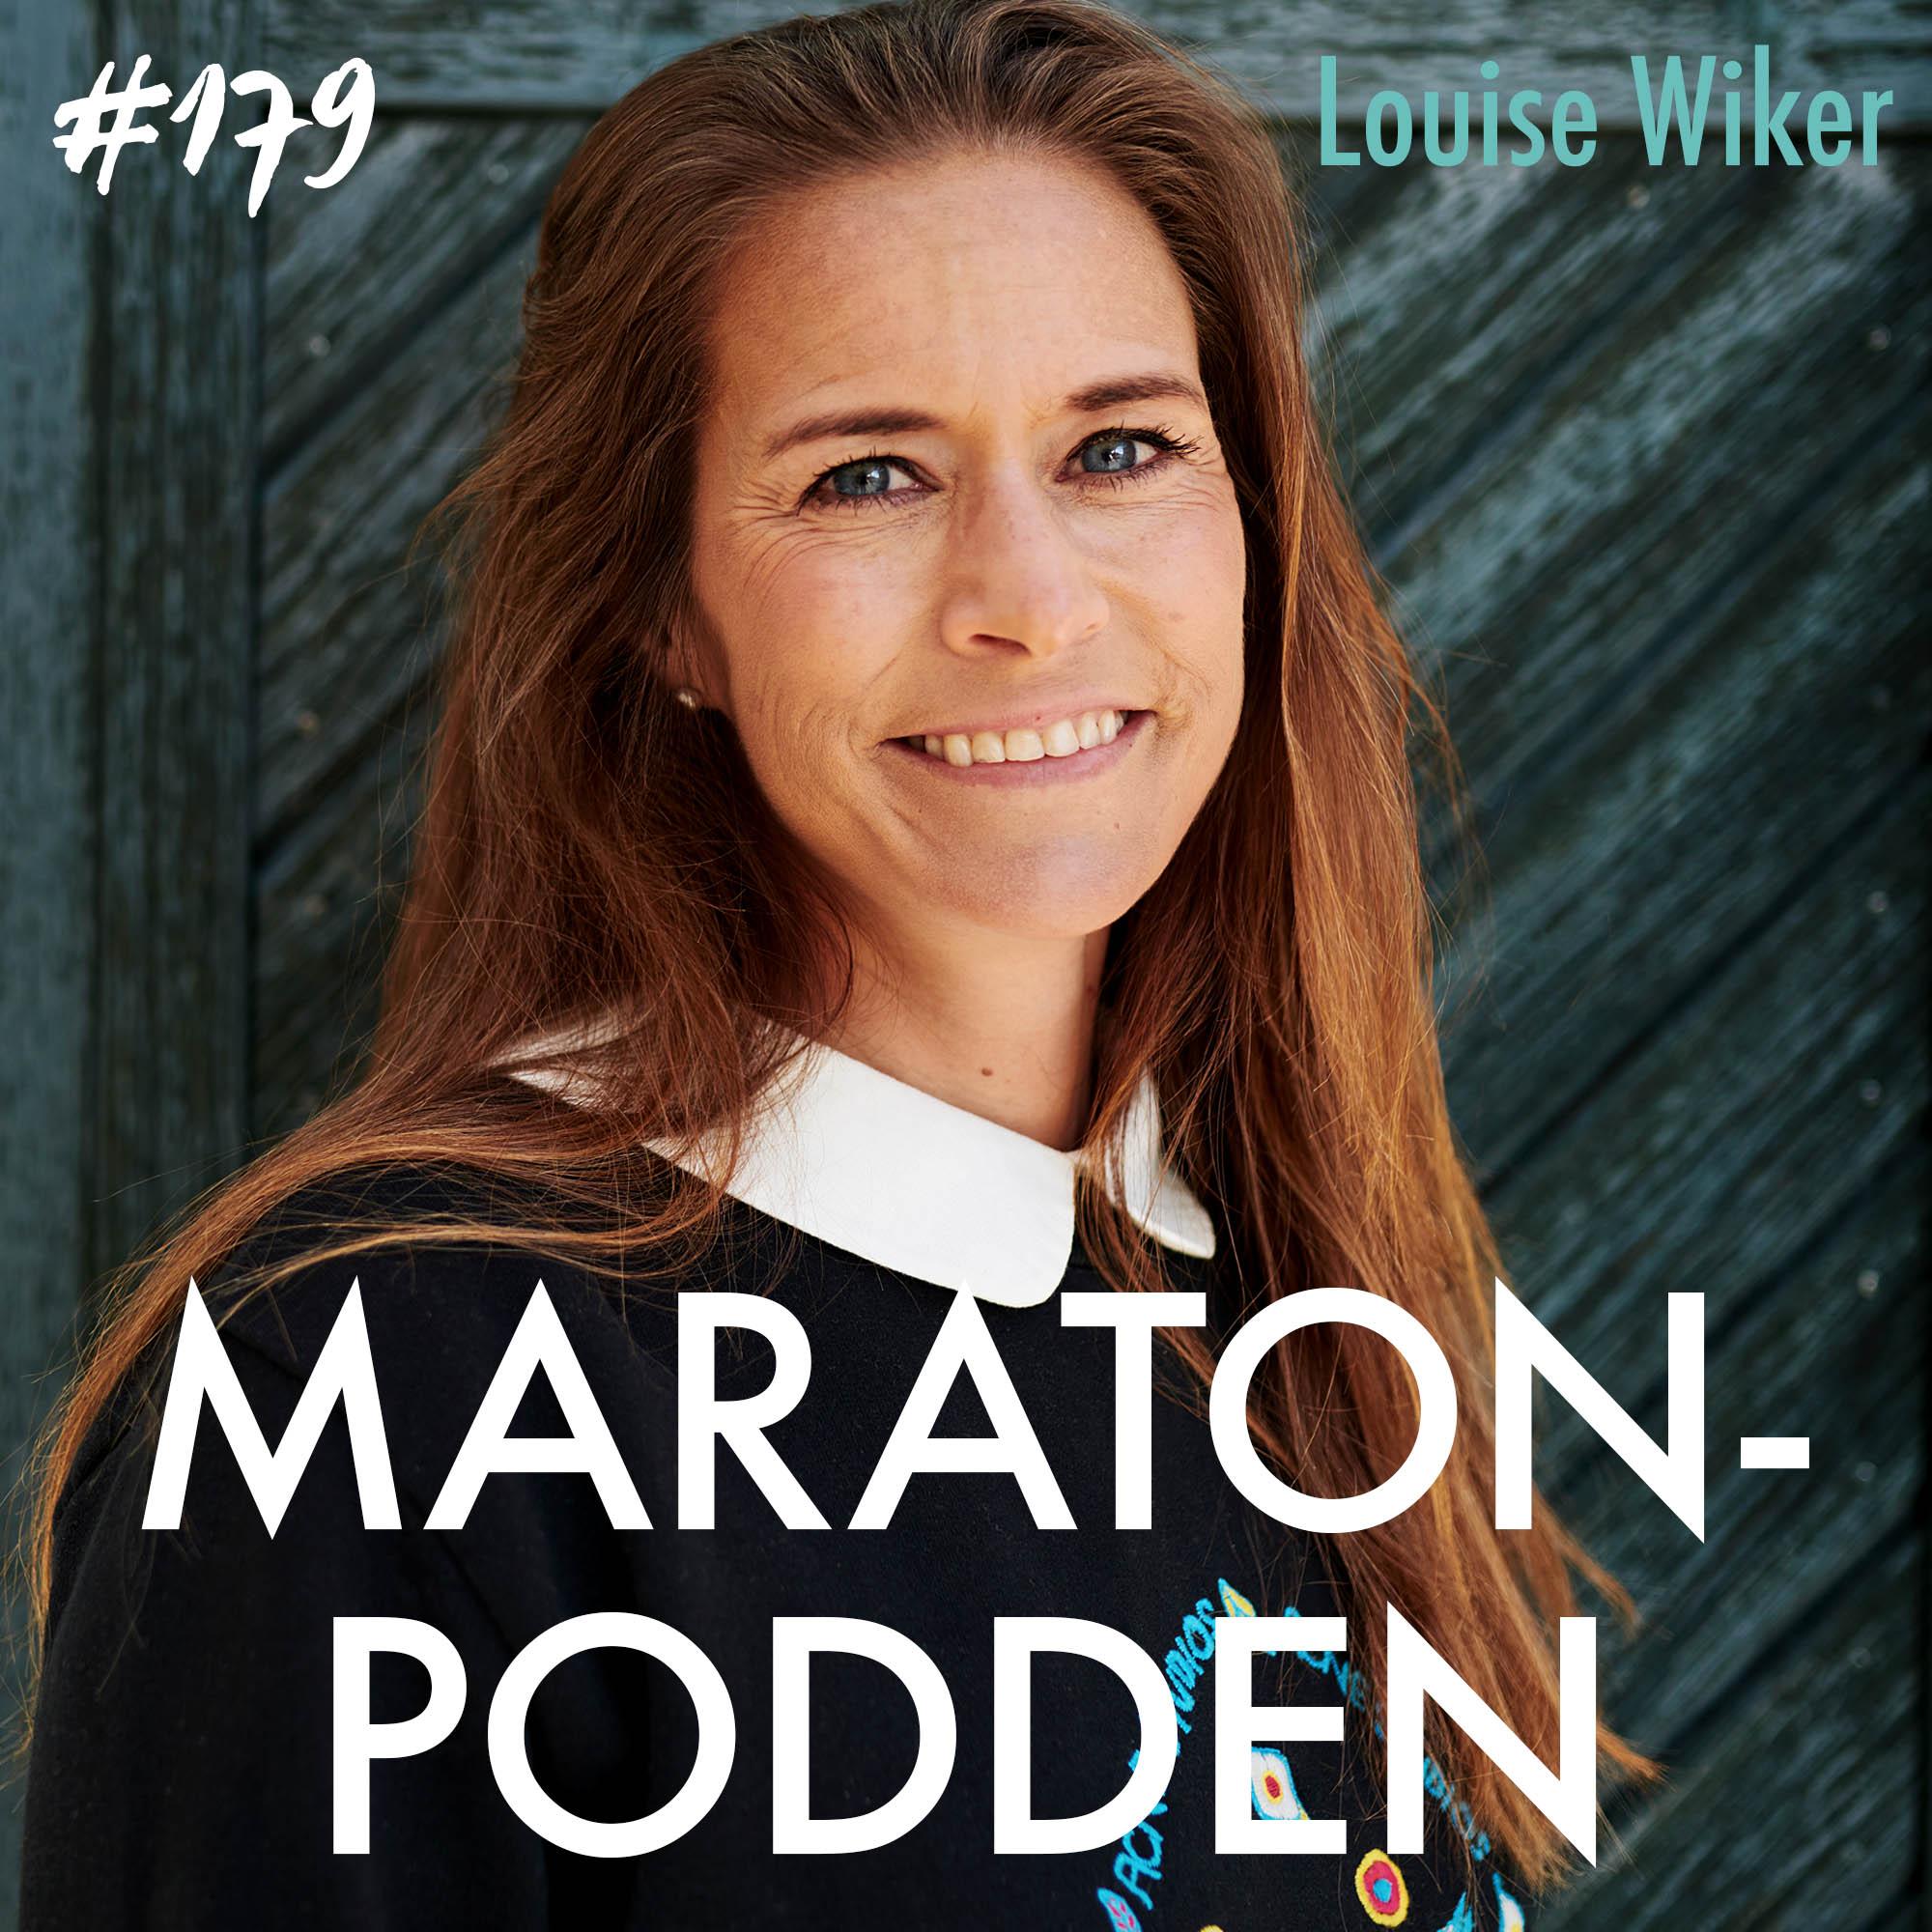 #179: Louise Wiker, maraton, smörkola och skummande cappuccino